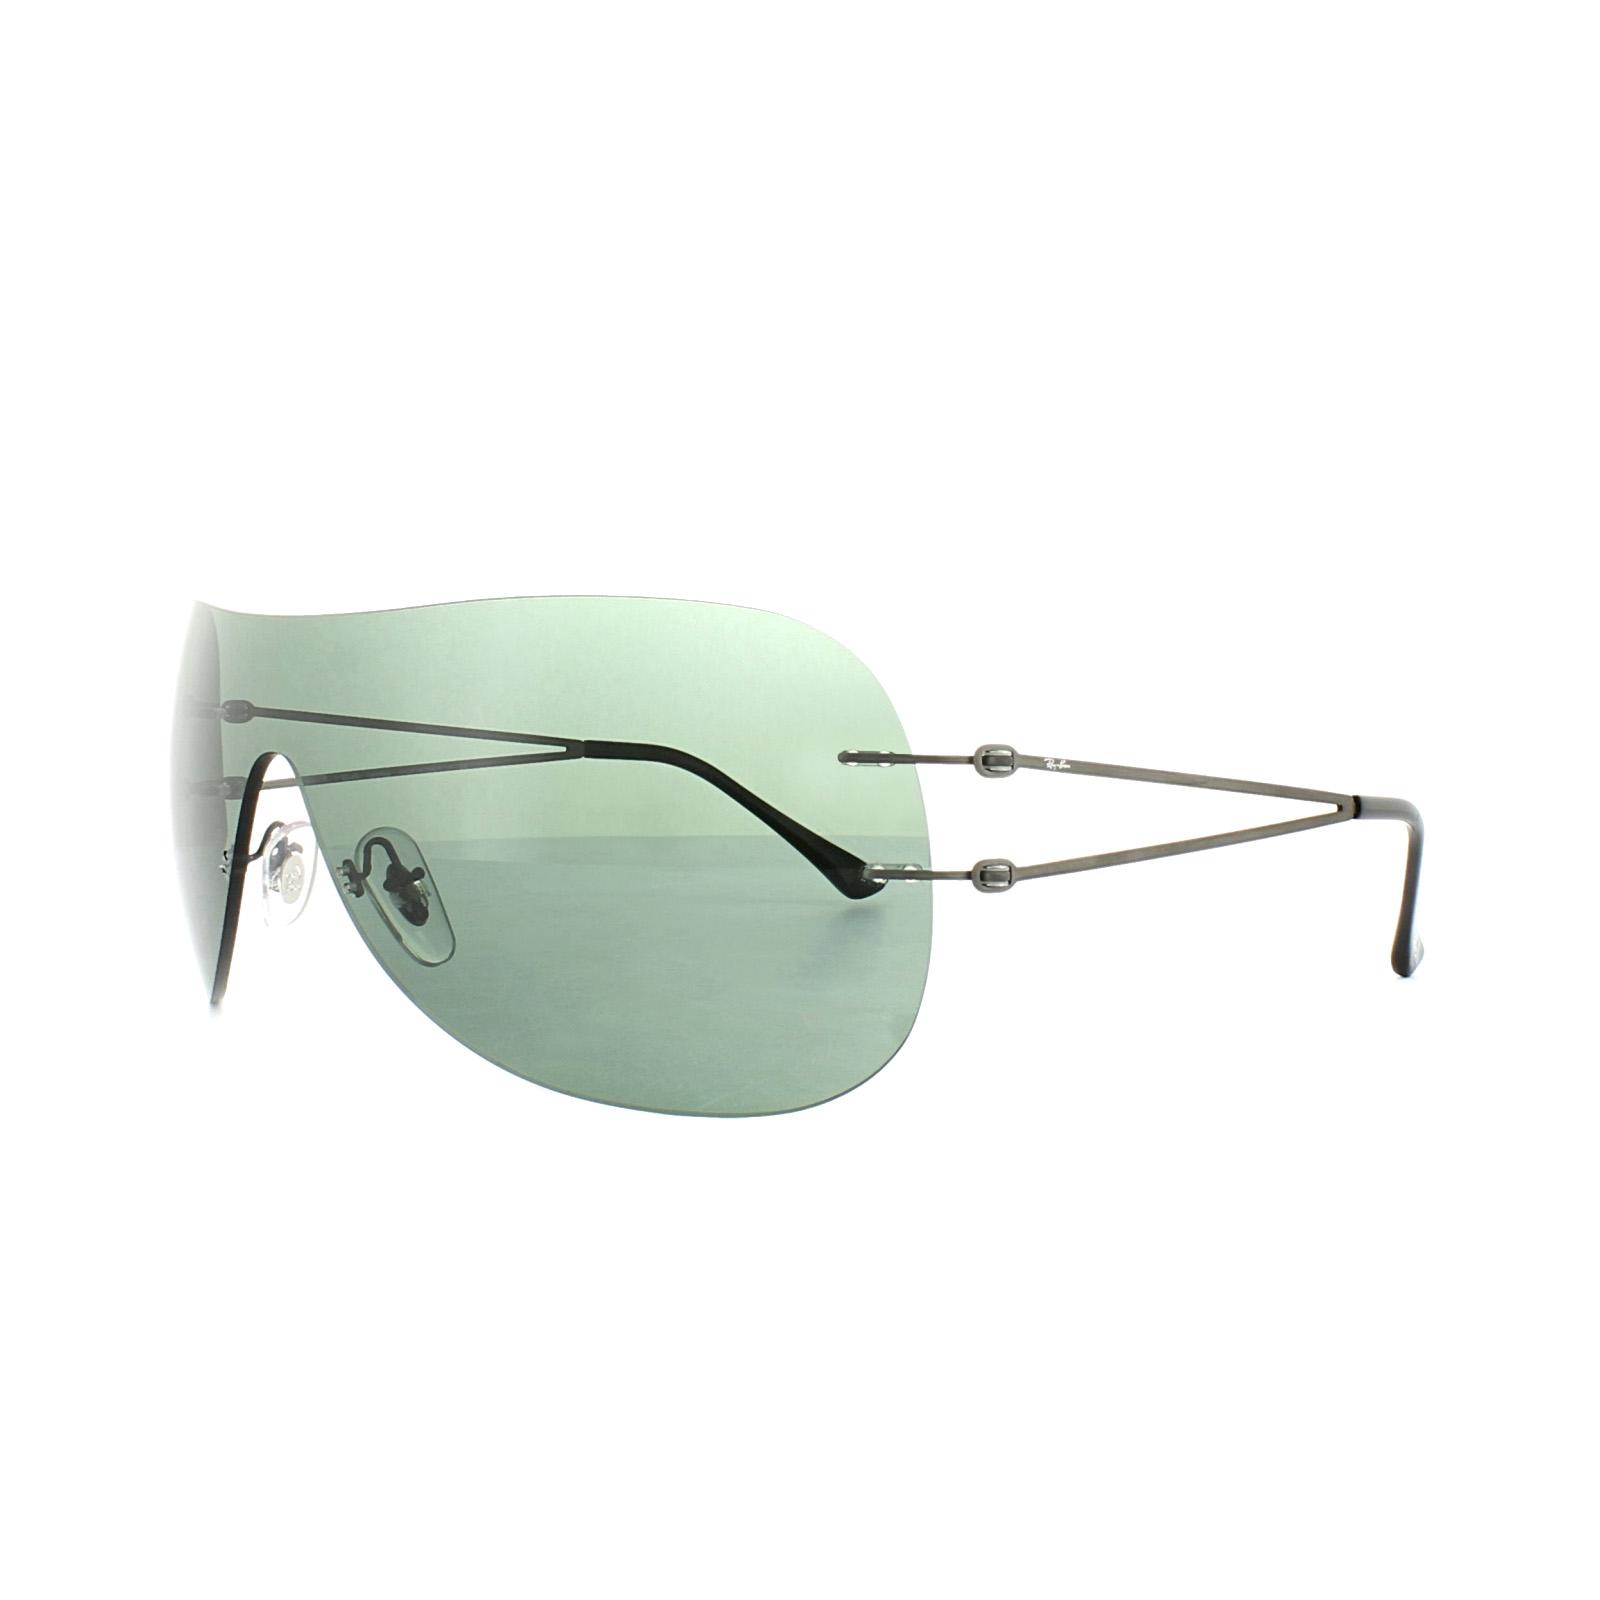 e89c7ecd9e1 Ray-Ban Sunglasses 8057 154 71 Dark Gunmetal Green 8053672637441